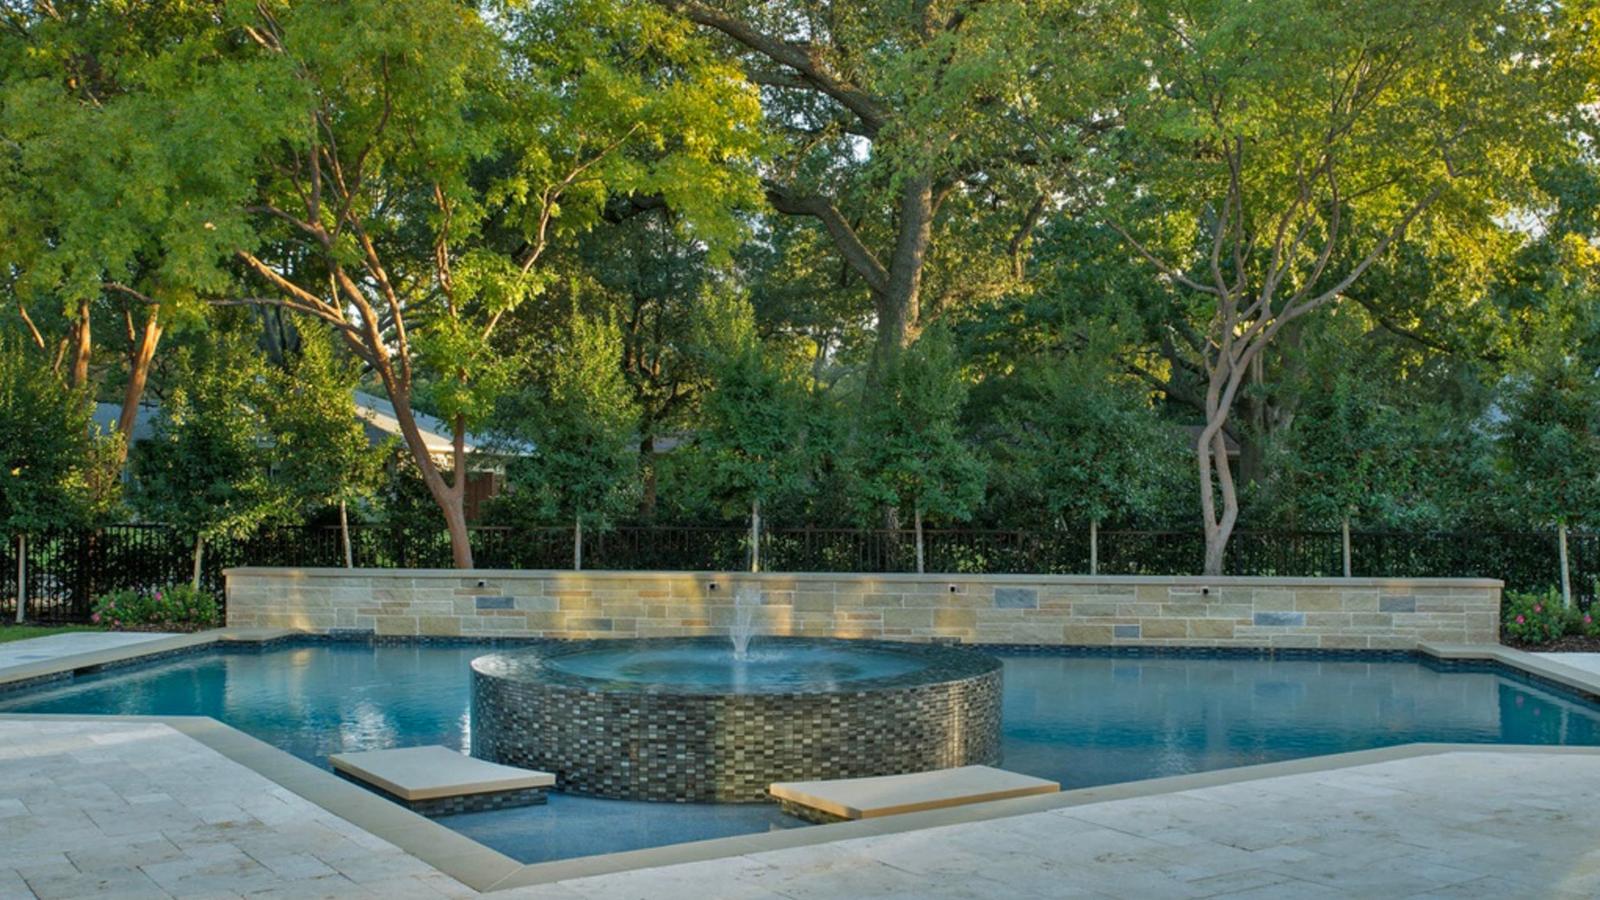 ddla-royalton-pool-spa-garden.jpg